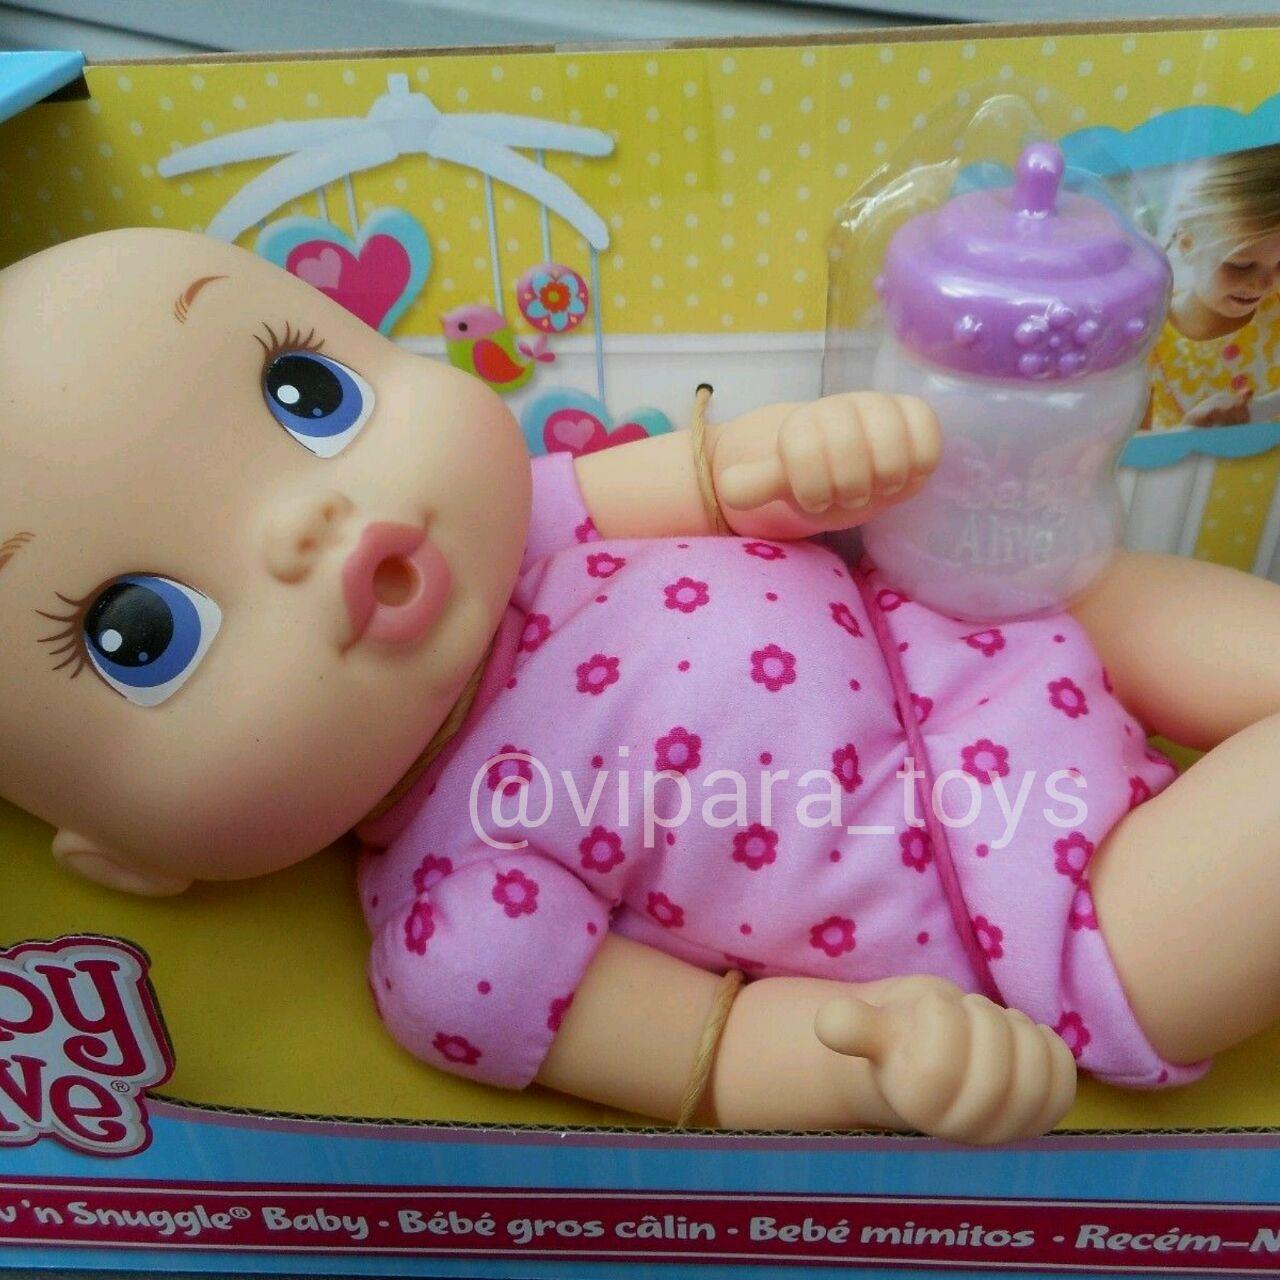 Jual Boneka Baby Alive Luv and Snuggle Original Hasbro - VIPARA ... c1d5dc88db